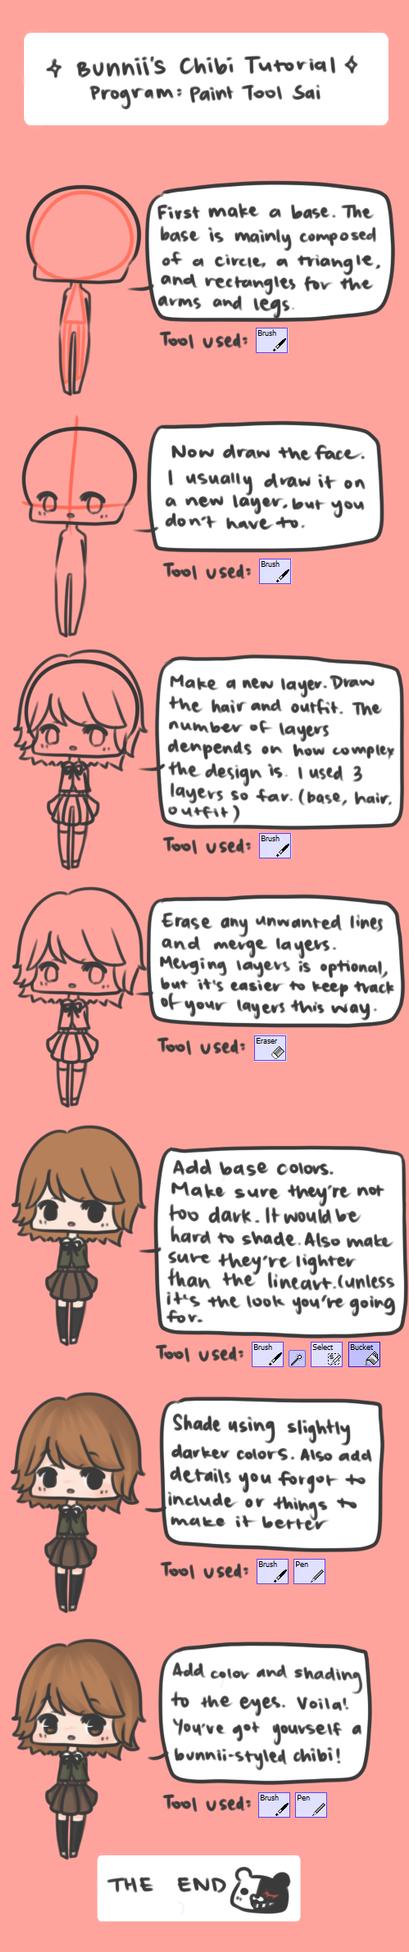 bunnii's chibi tutorial by pinkbunnii